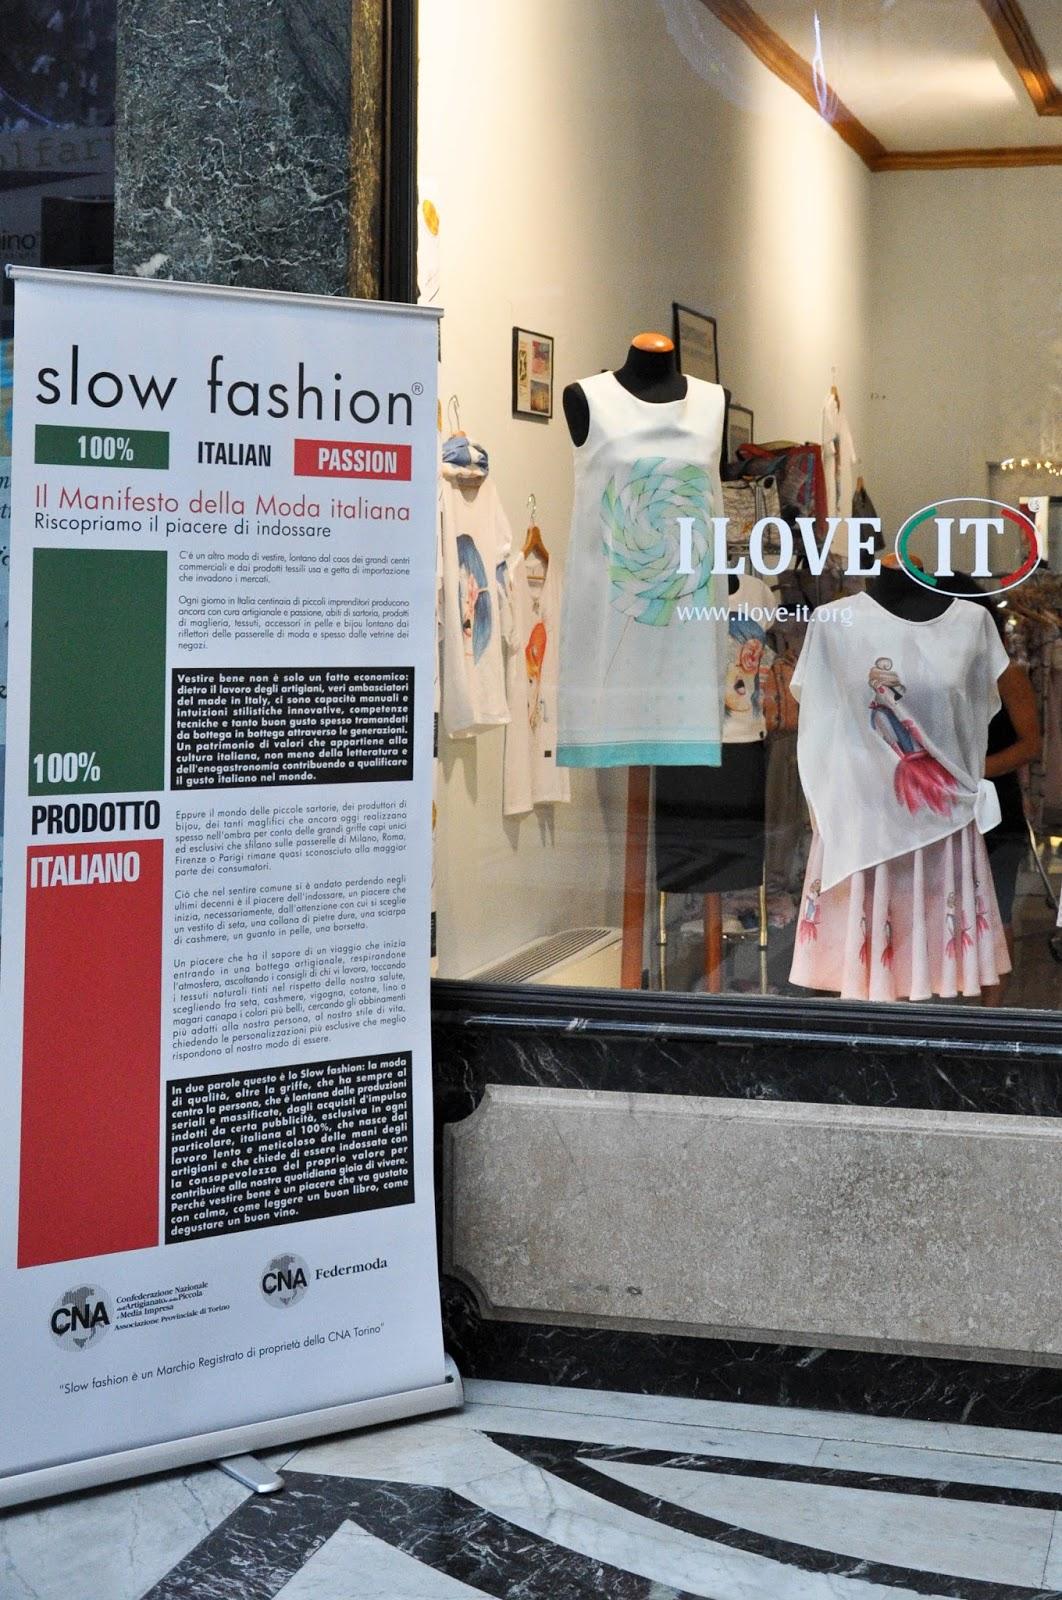 Slow Fashion Movement, Galleria San Federico, Turin, Italy